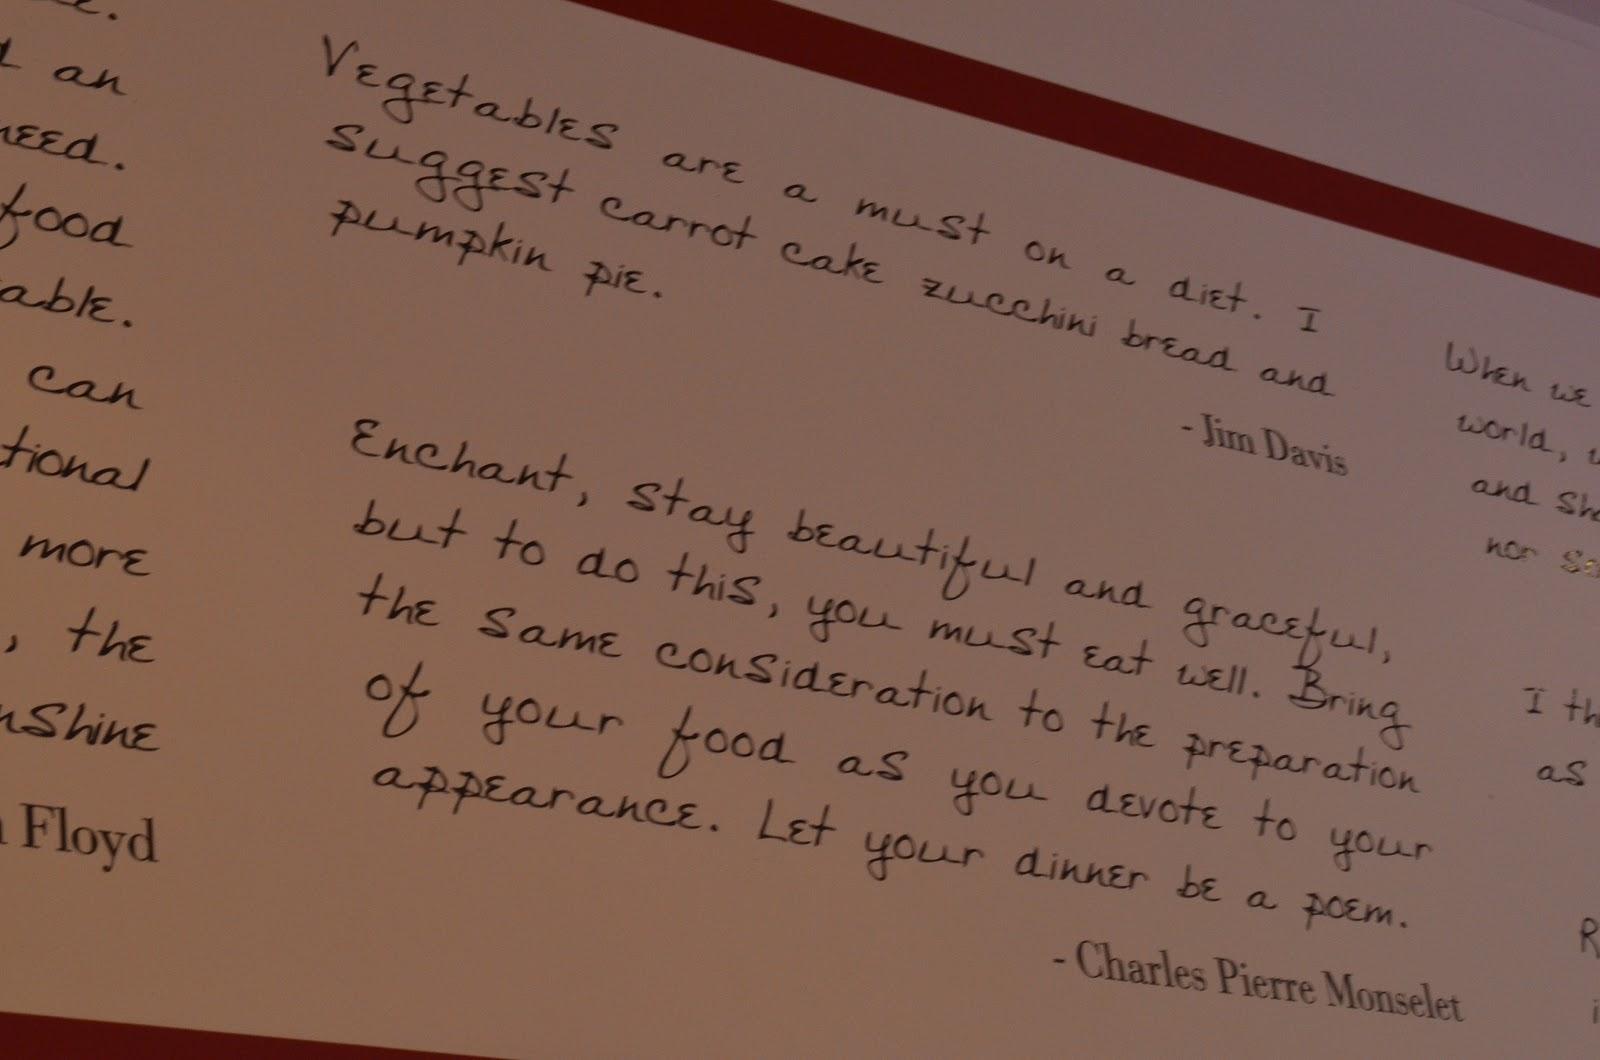 Italian Love Quotes Sa's Top Italian Restaurant Cafe Del Sol  Jozilicious  A